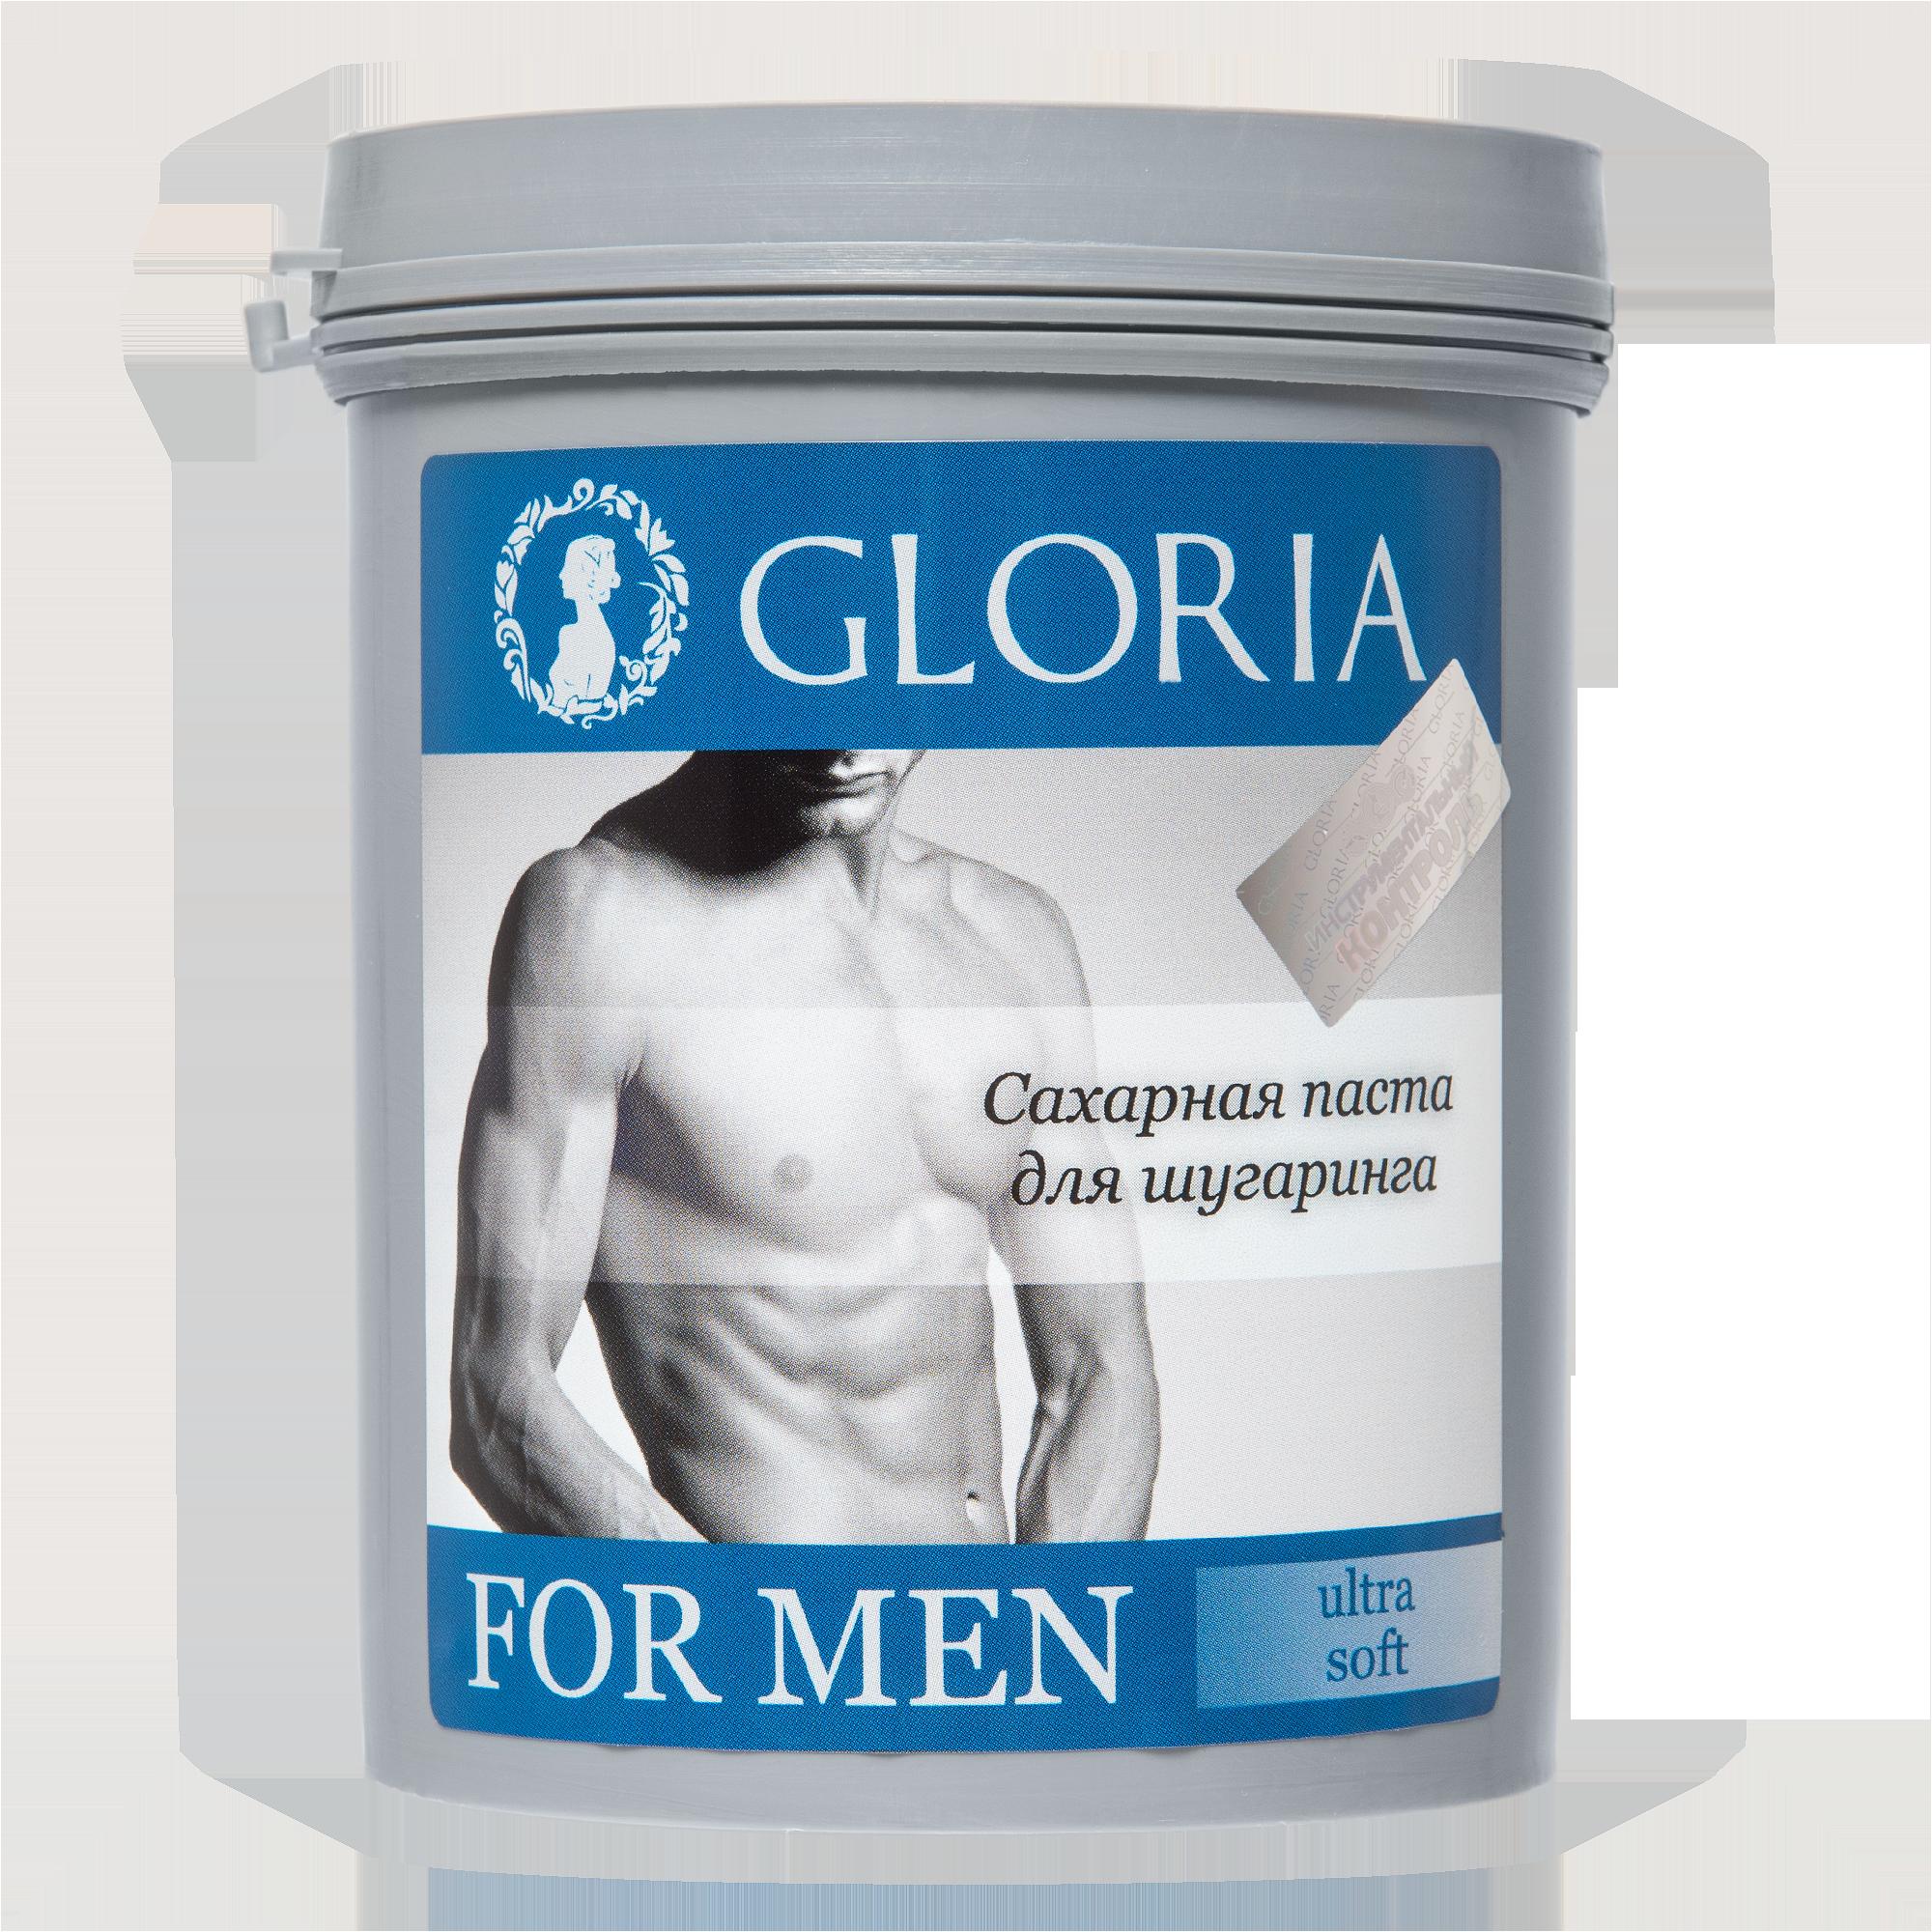 GLORIA Паста сахарная для депиляции FOR MEN Ultra Soft / GLORIA, 0,8 кг